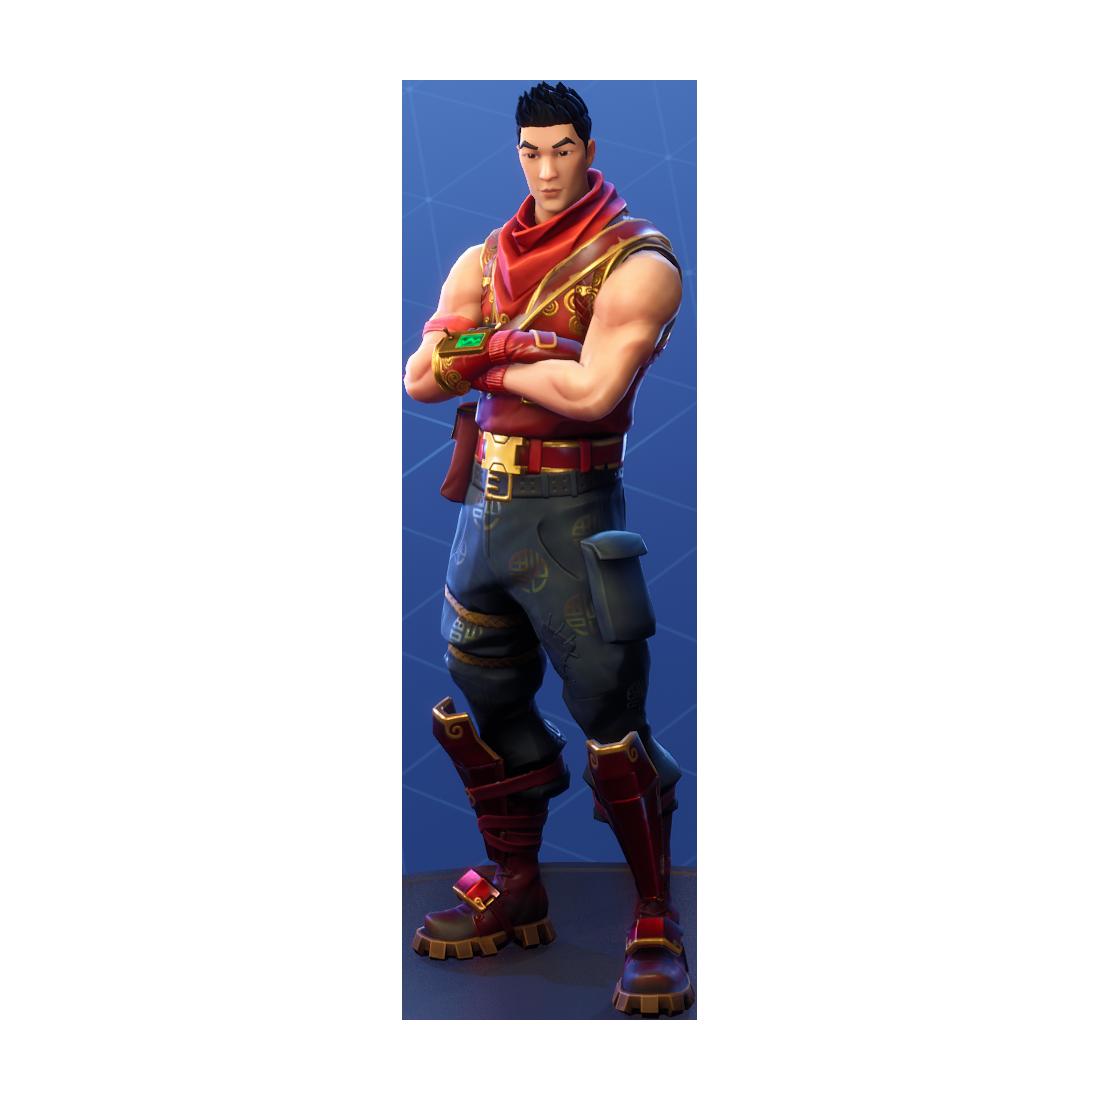 Crimson Scout - Crimson Scout (Малиновый разведчик)